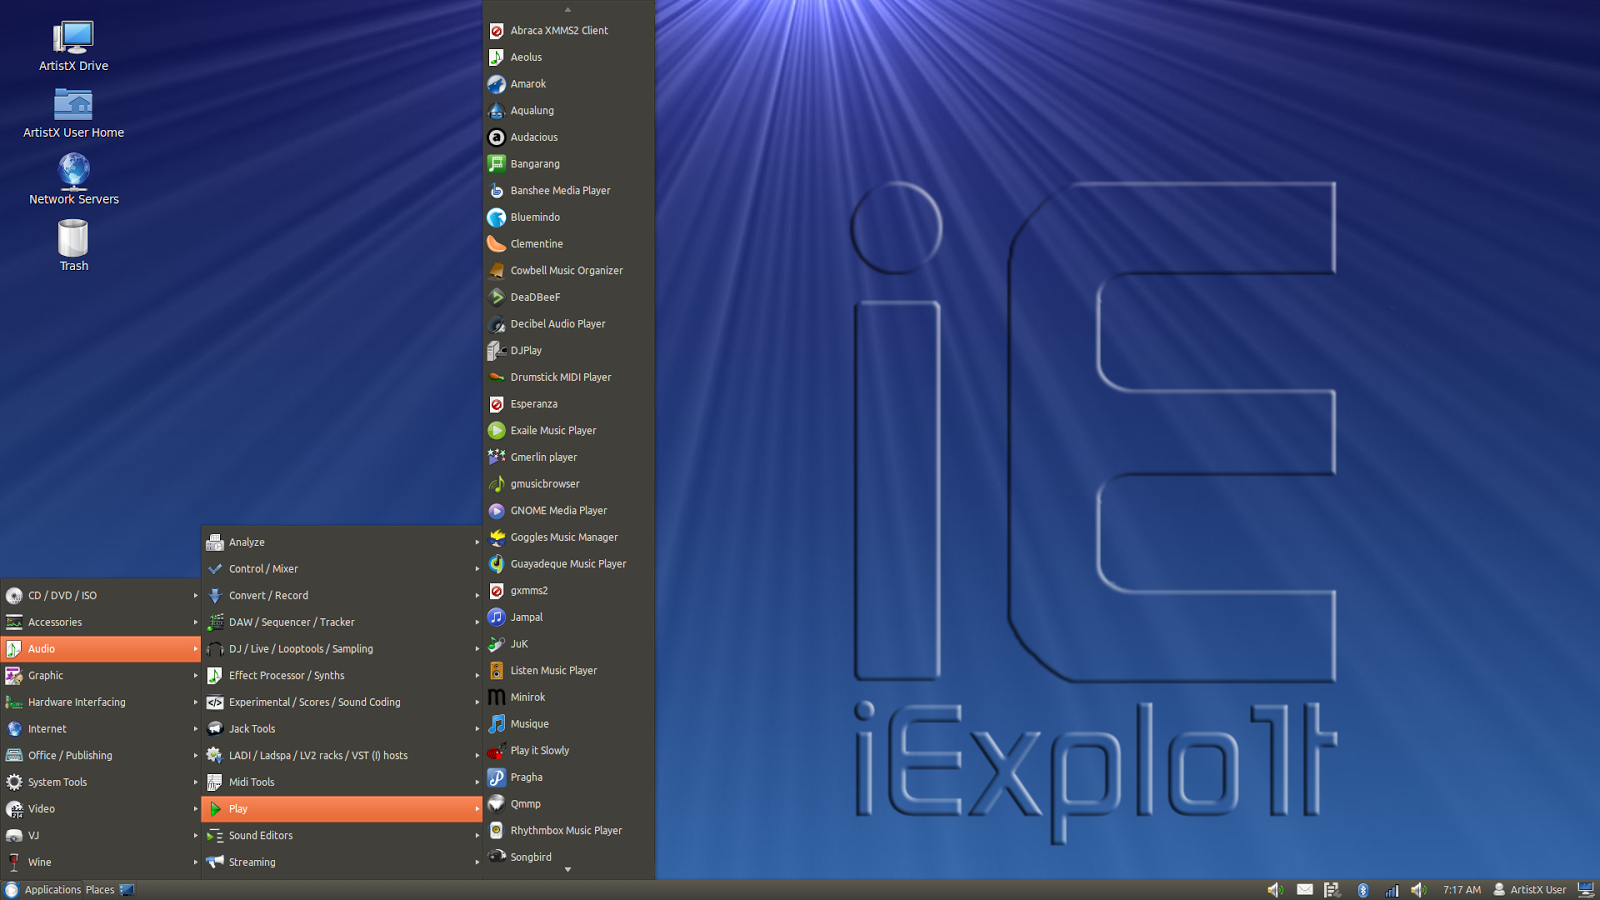 ArtistX The Linux Distro for Artists iExplo1t 1600x900